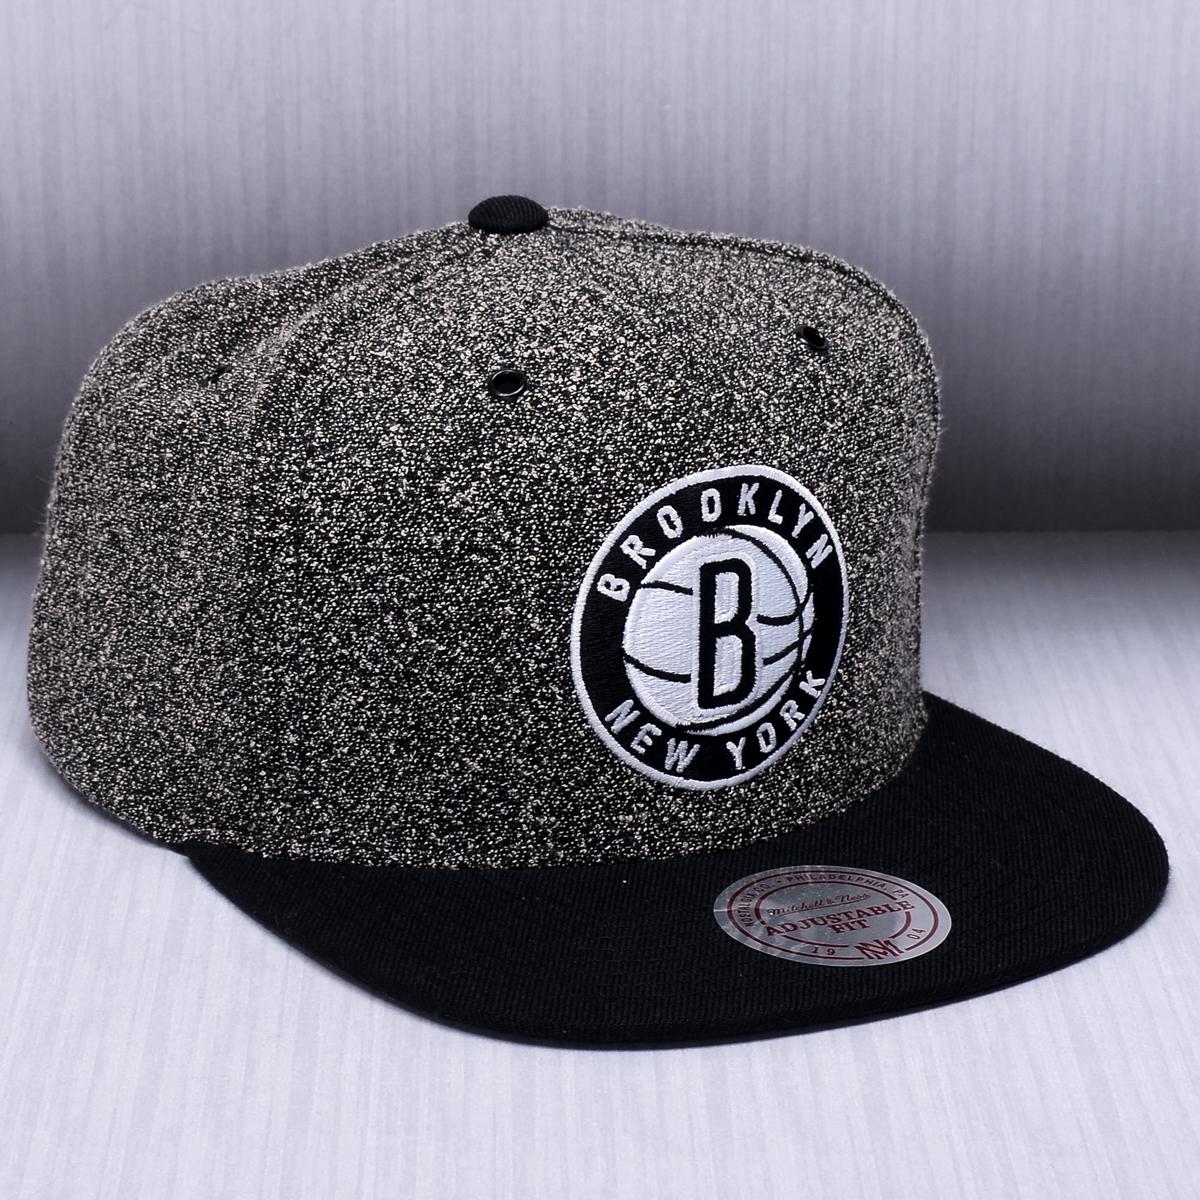 854a31fb96d Mitchell   Ness NBA Brooklyn Nets Static 2 Tone Snapback Cap - NBA Shop Brooklyn  Nets Merchandise - Superfanas.lt